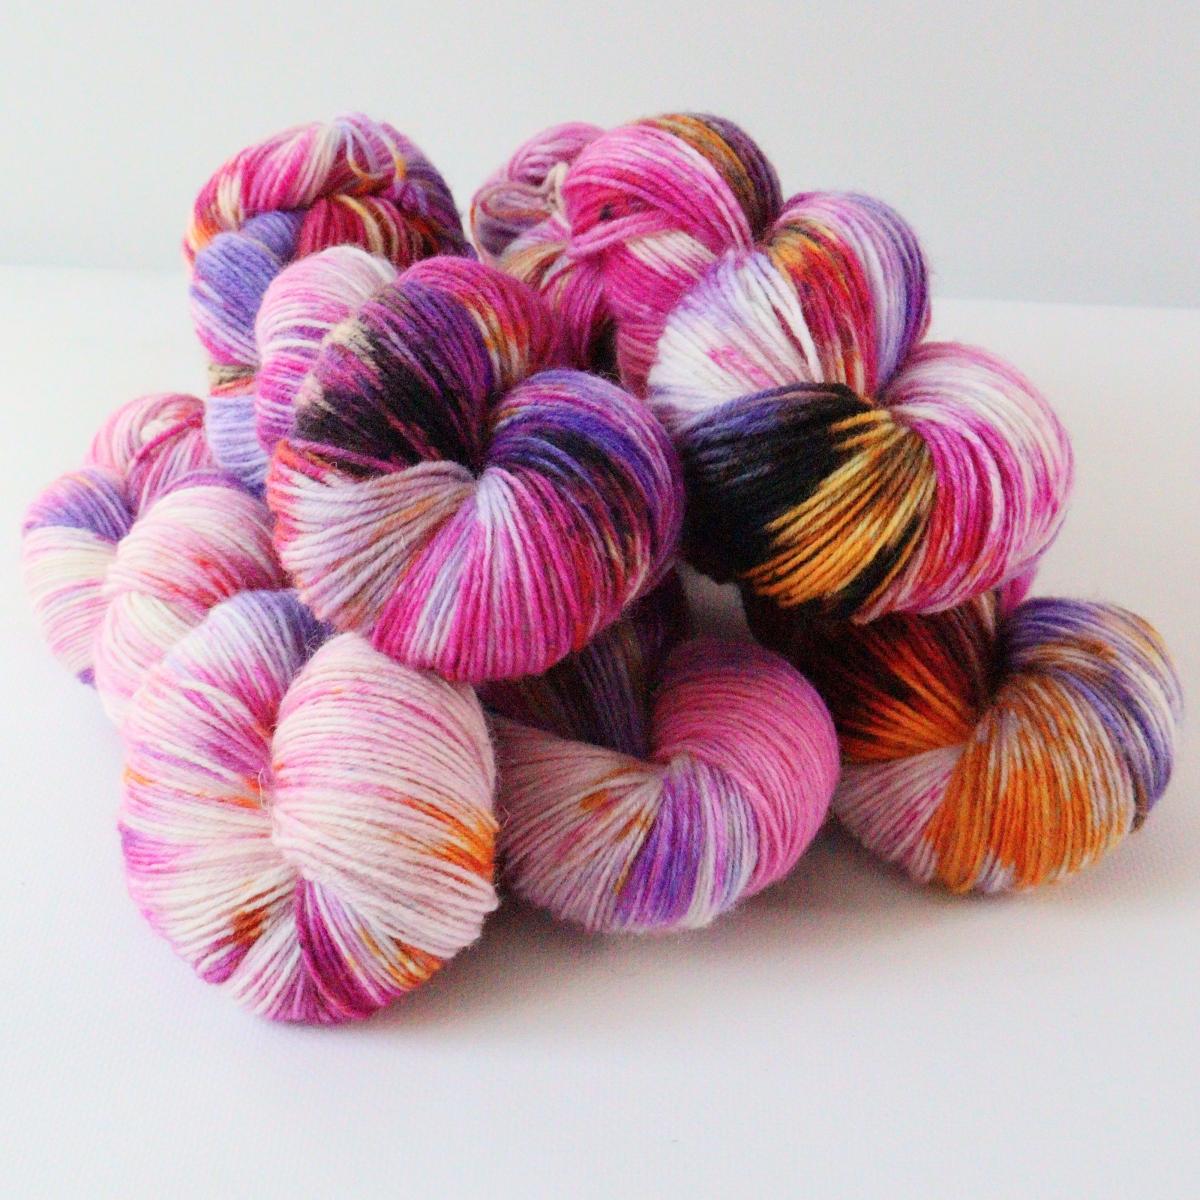 woodico.pro hand dyed yarn 084 1 1200x1200 - Hand dyed yarn / 084